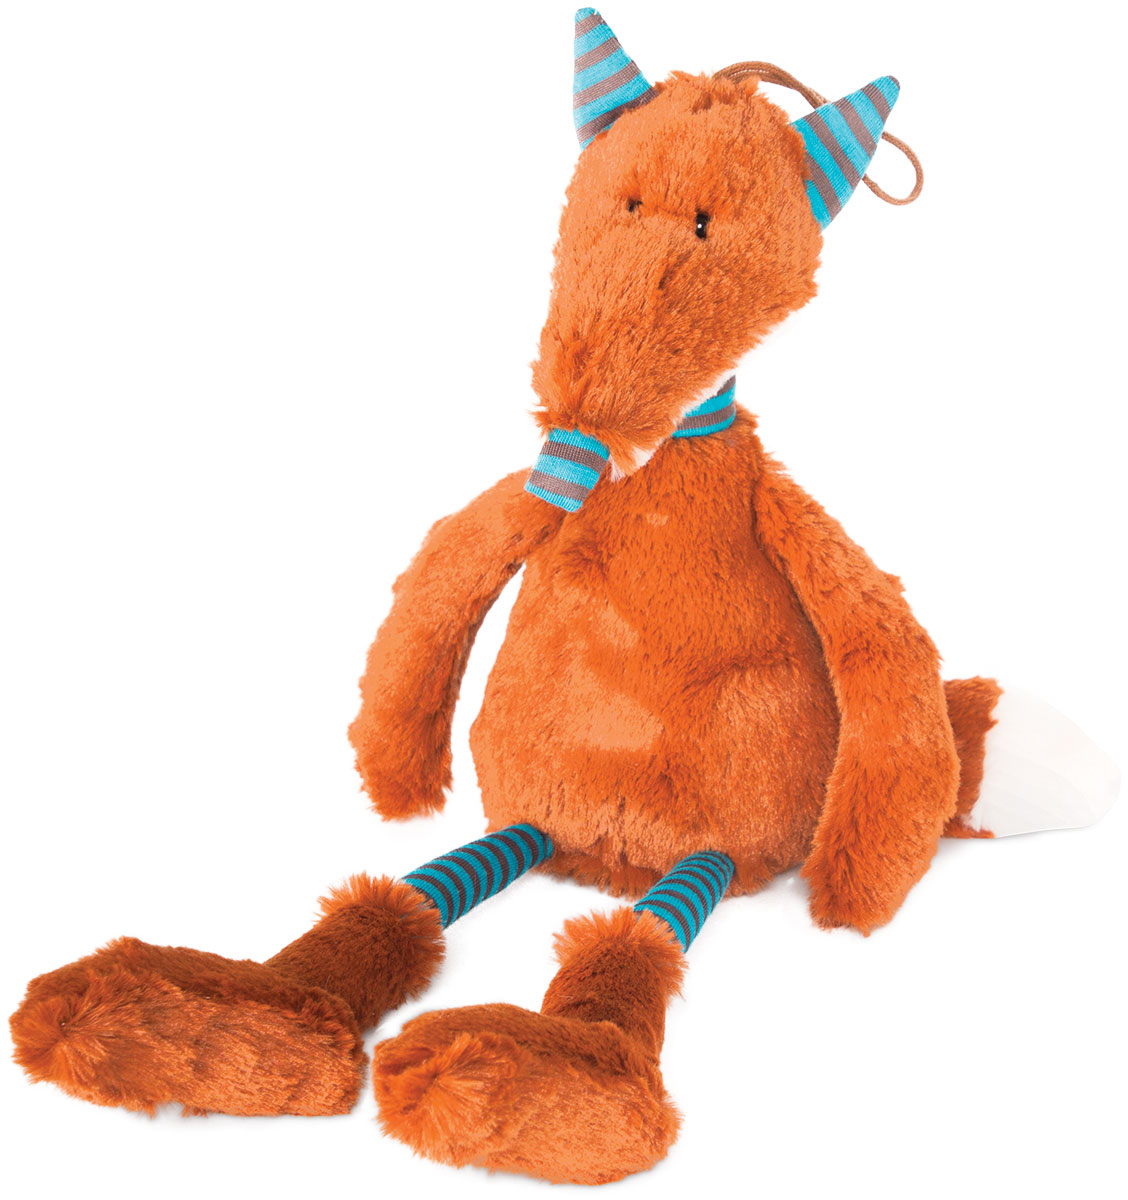 Gulliver Мягкая игрушка Лис Фокси 38 см gulliver мягкая игрушка лис фокси 38 см